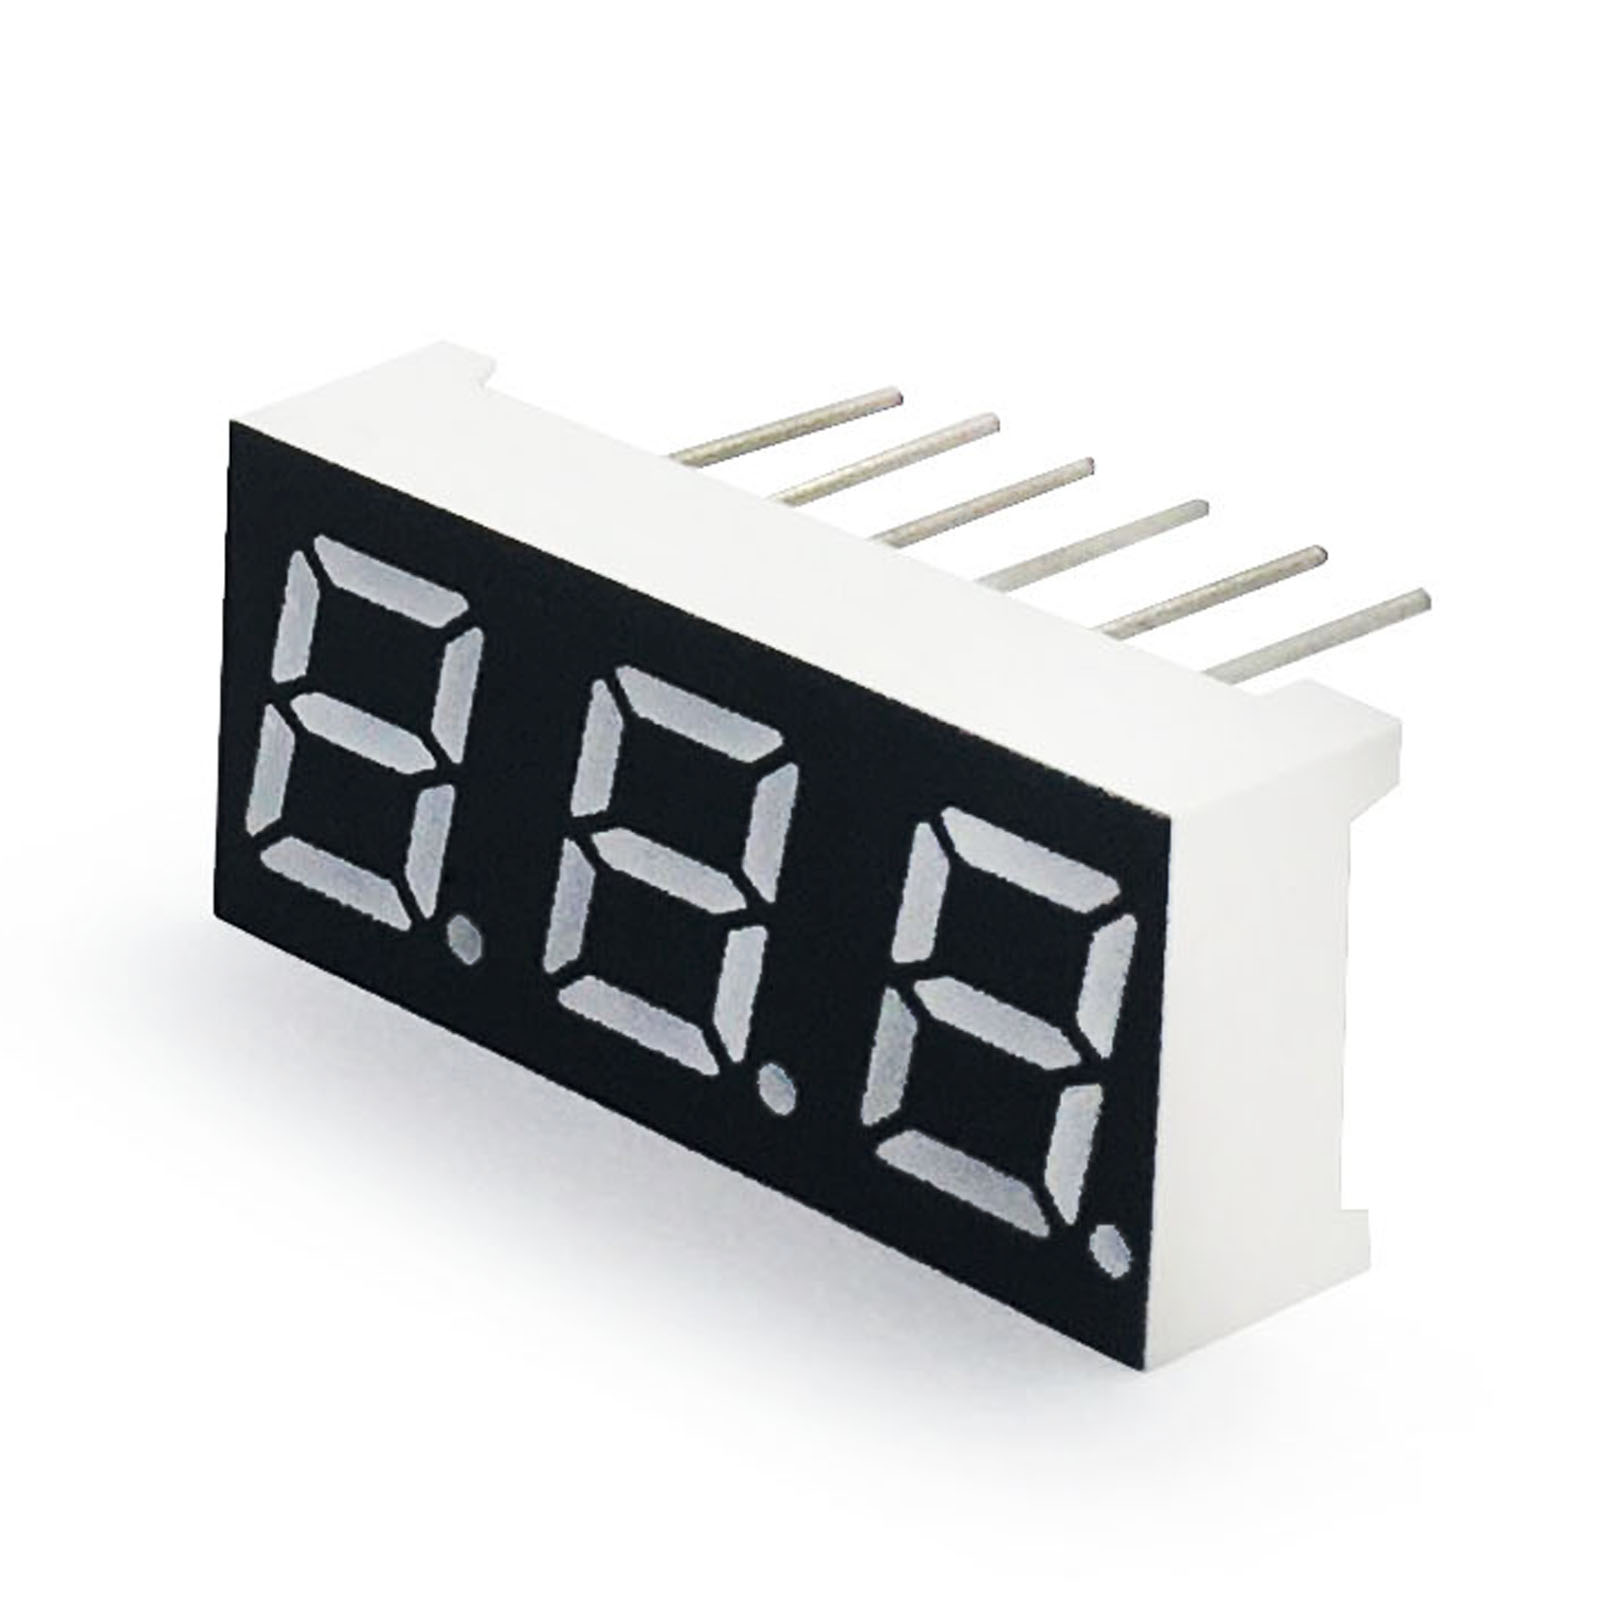 MCIGICM 100pcs 7 Segment Common Cathode 3 Bit Digital Tube 0.28